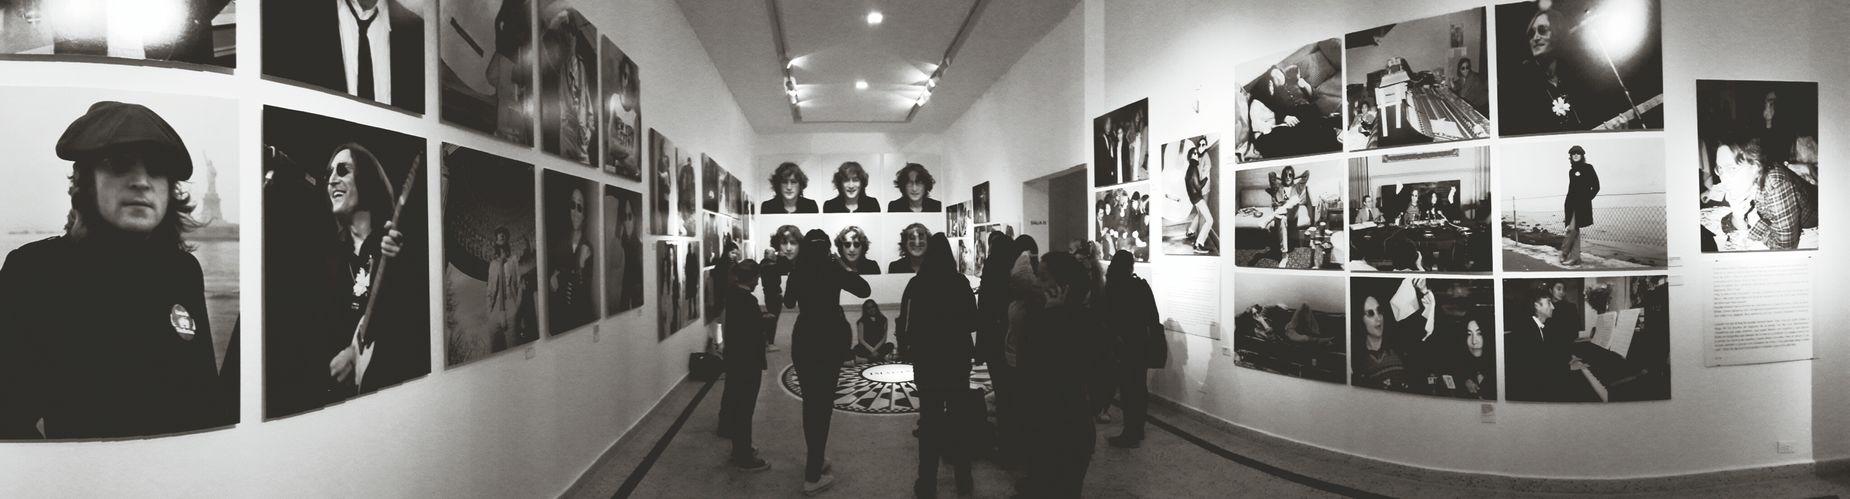 Museum Lennon Jonhlennon Photos